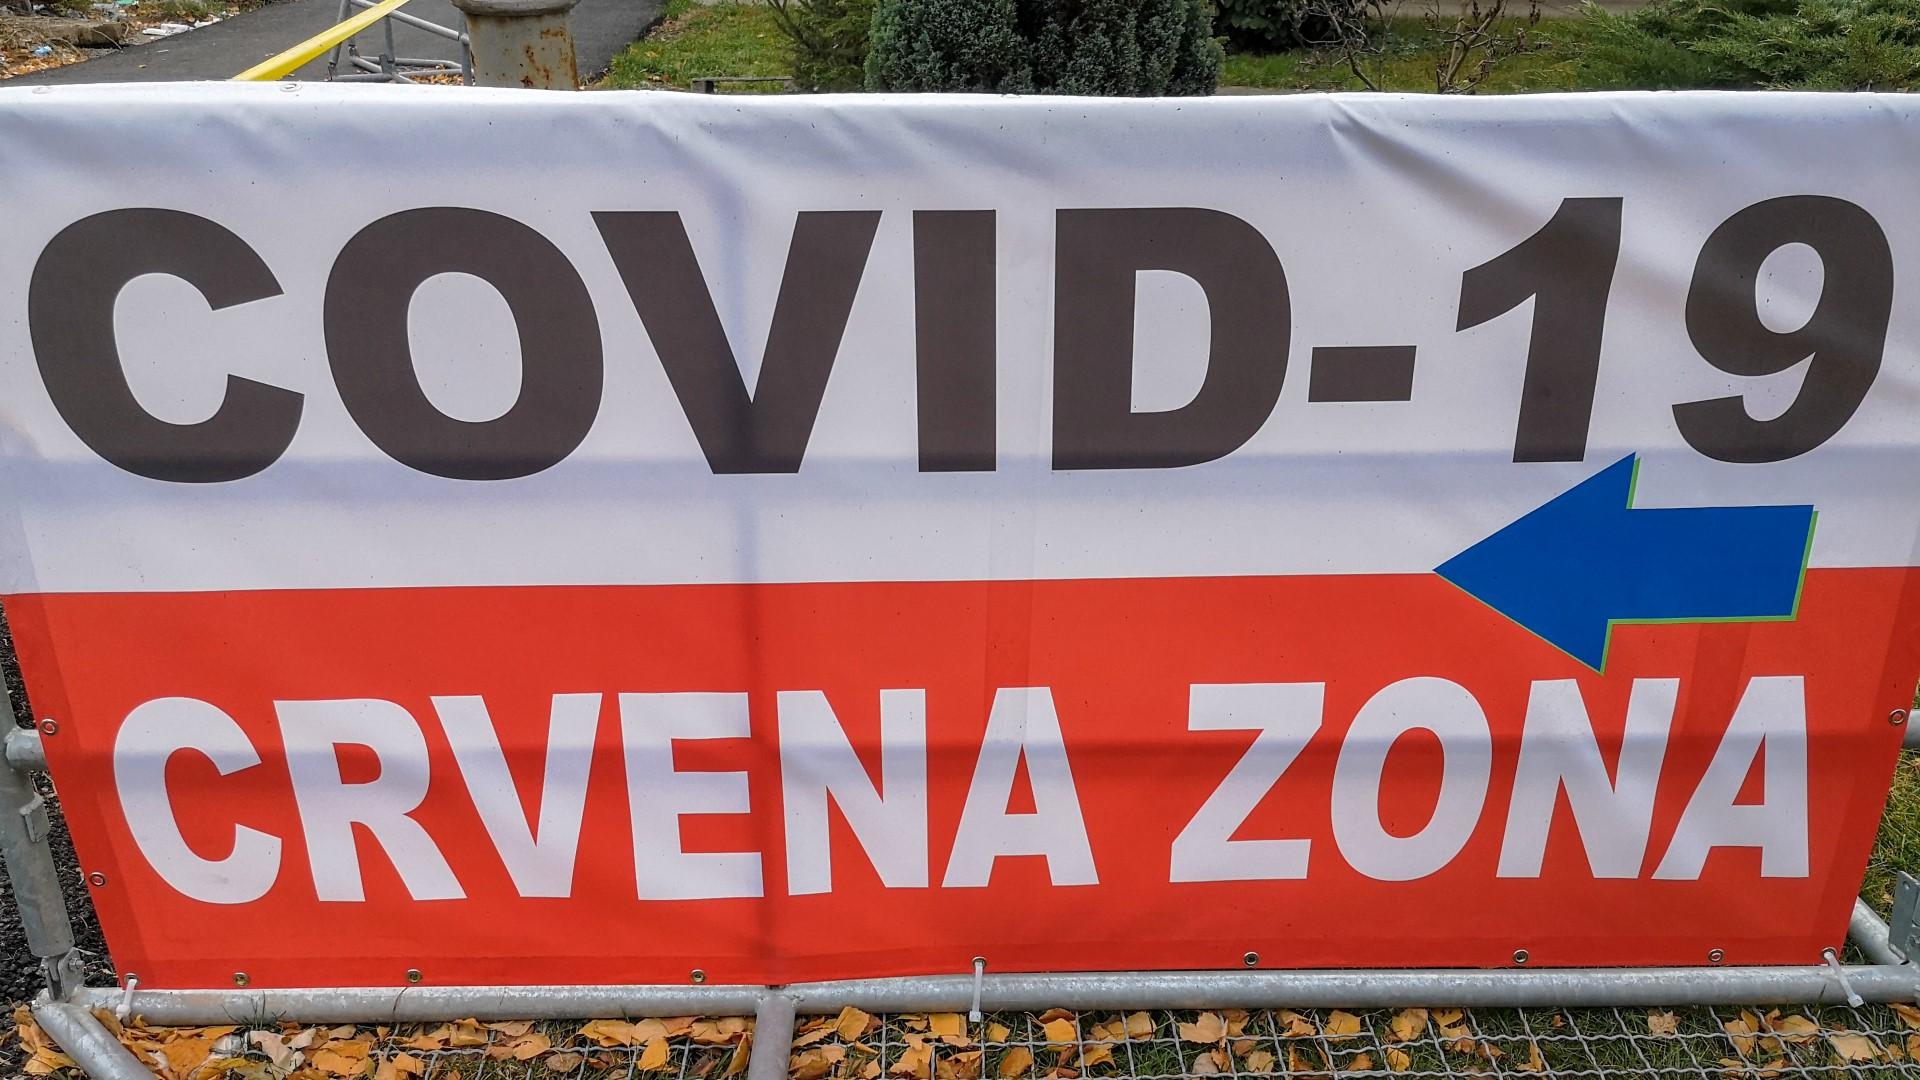 u-srbiji-dva-nova-smrtna-slucaja-od-kovida-19-obolela-jos-292-lica